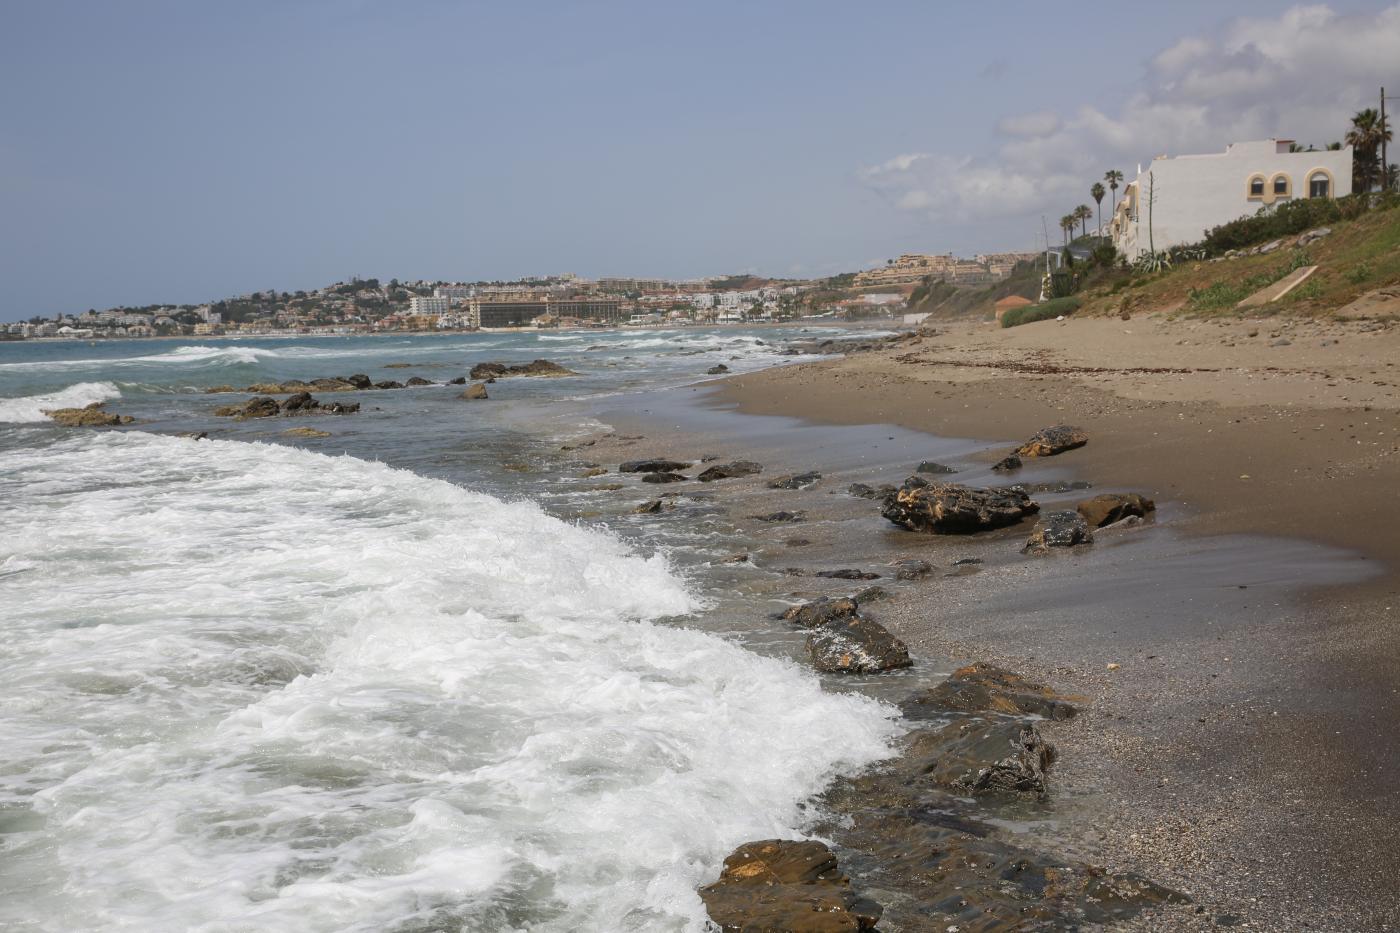 Playa de El Sheriff hacia La Cala de Mijas.